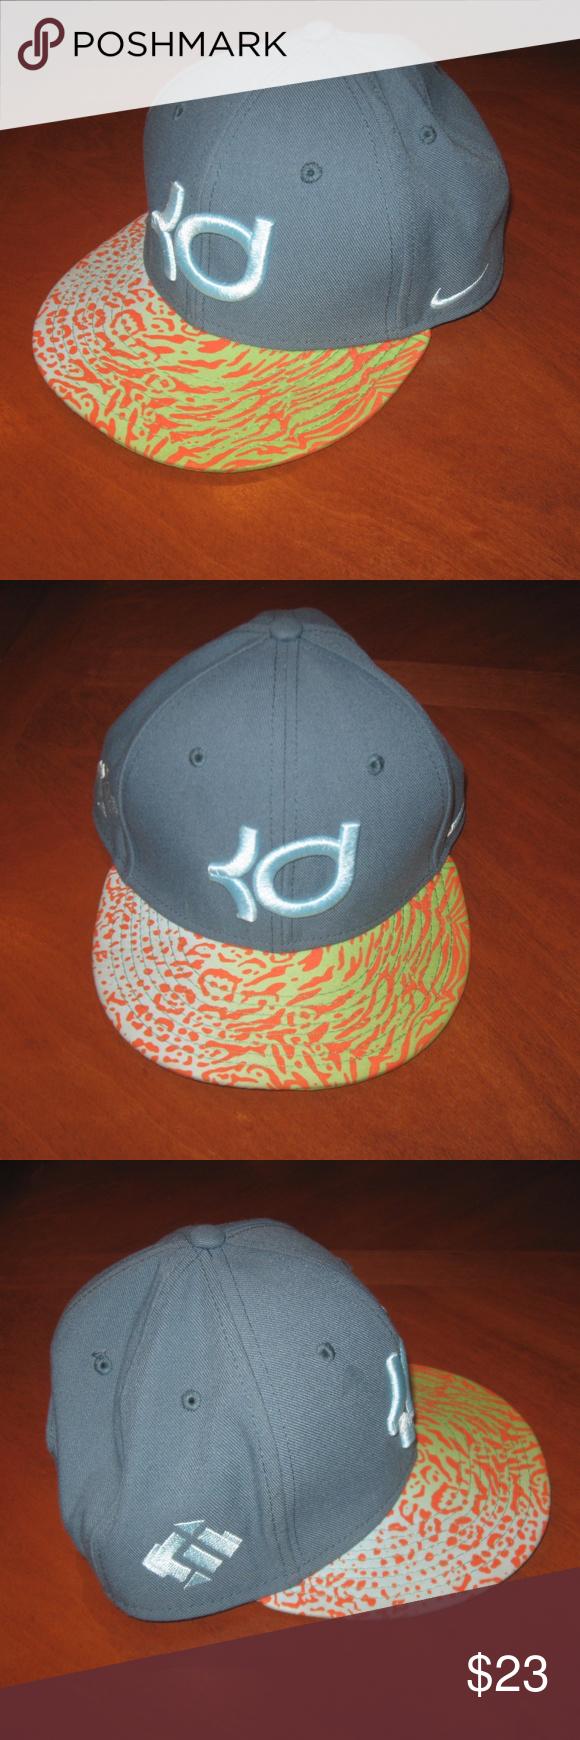 Nike KD Hat Green Snapback Excellent